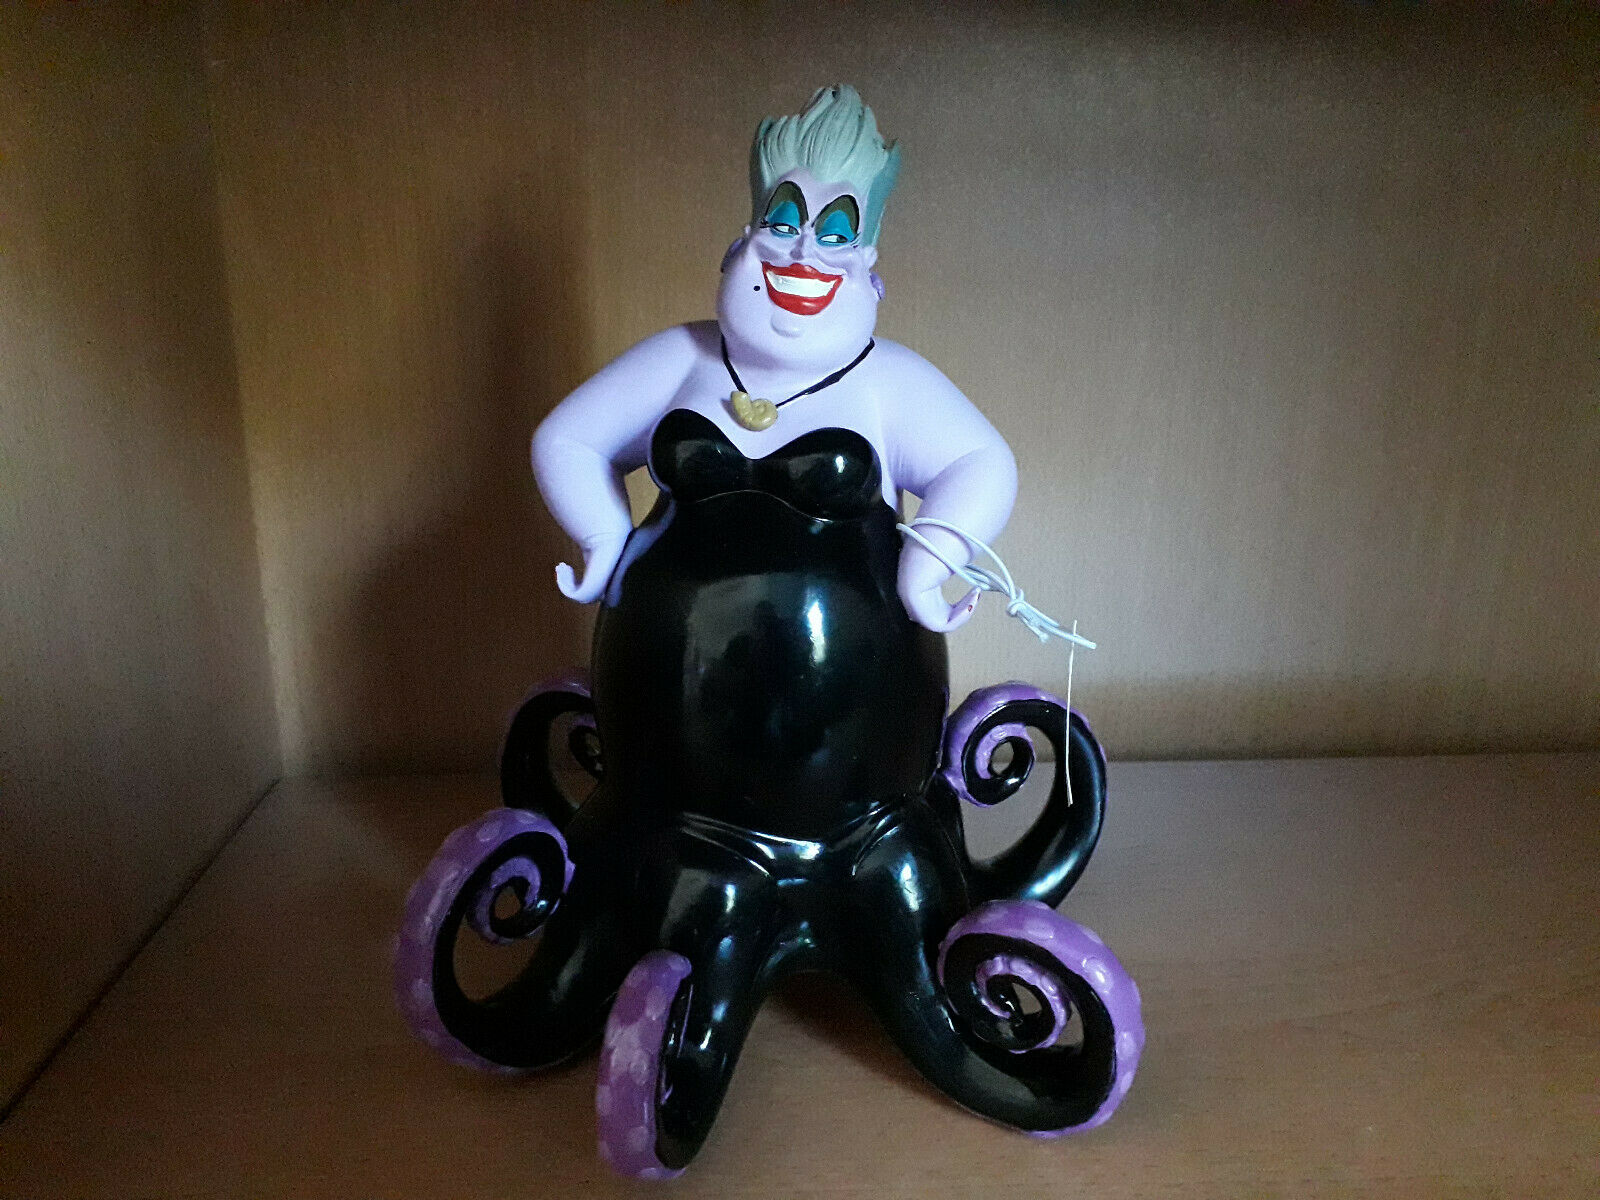 Enesco Ursula Seehexe Arielle Meerjungfrau Little Mermaid Disney Figur mit OVP